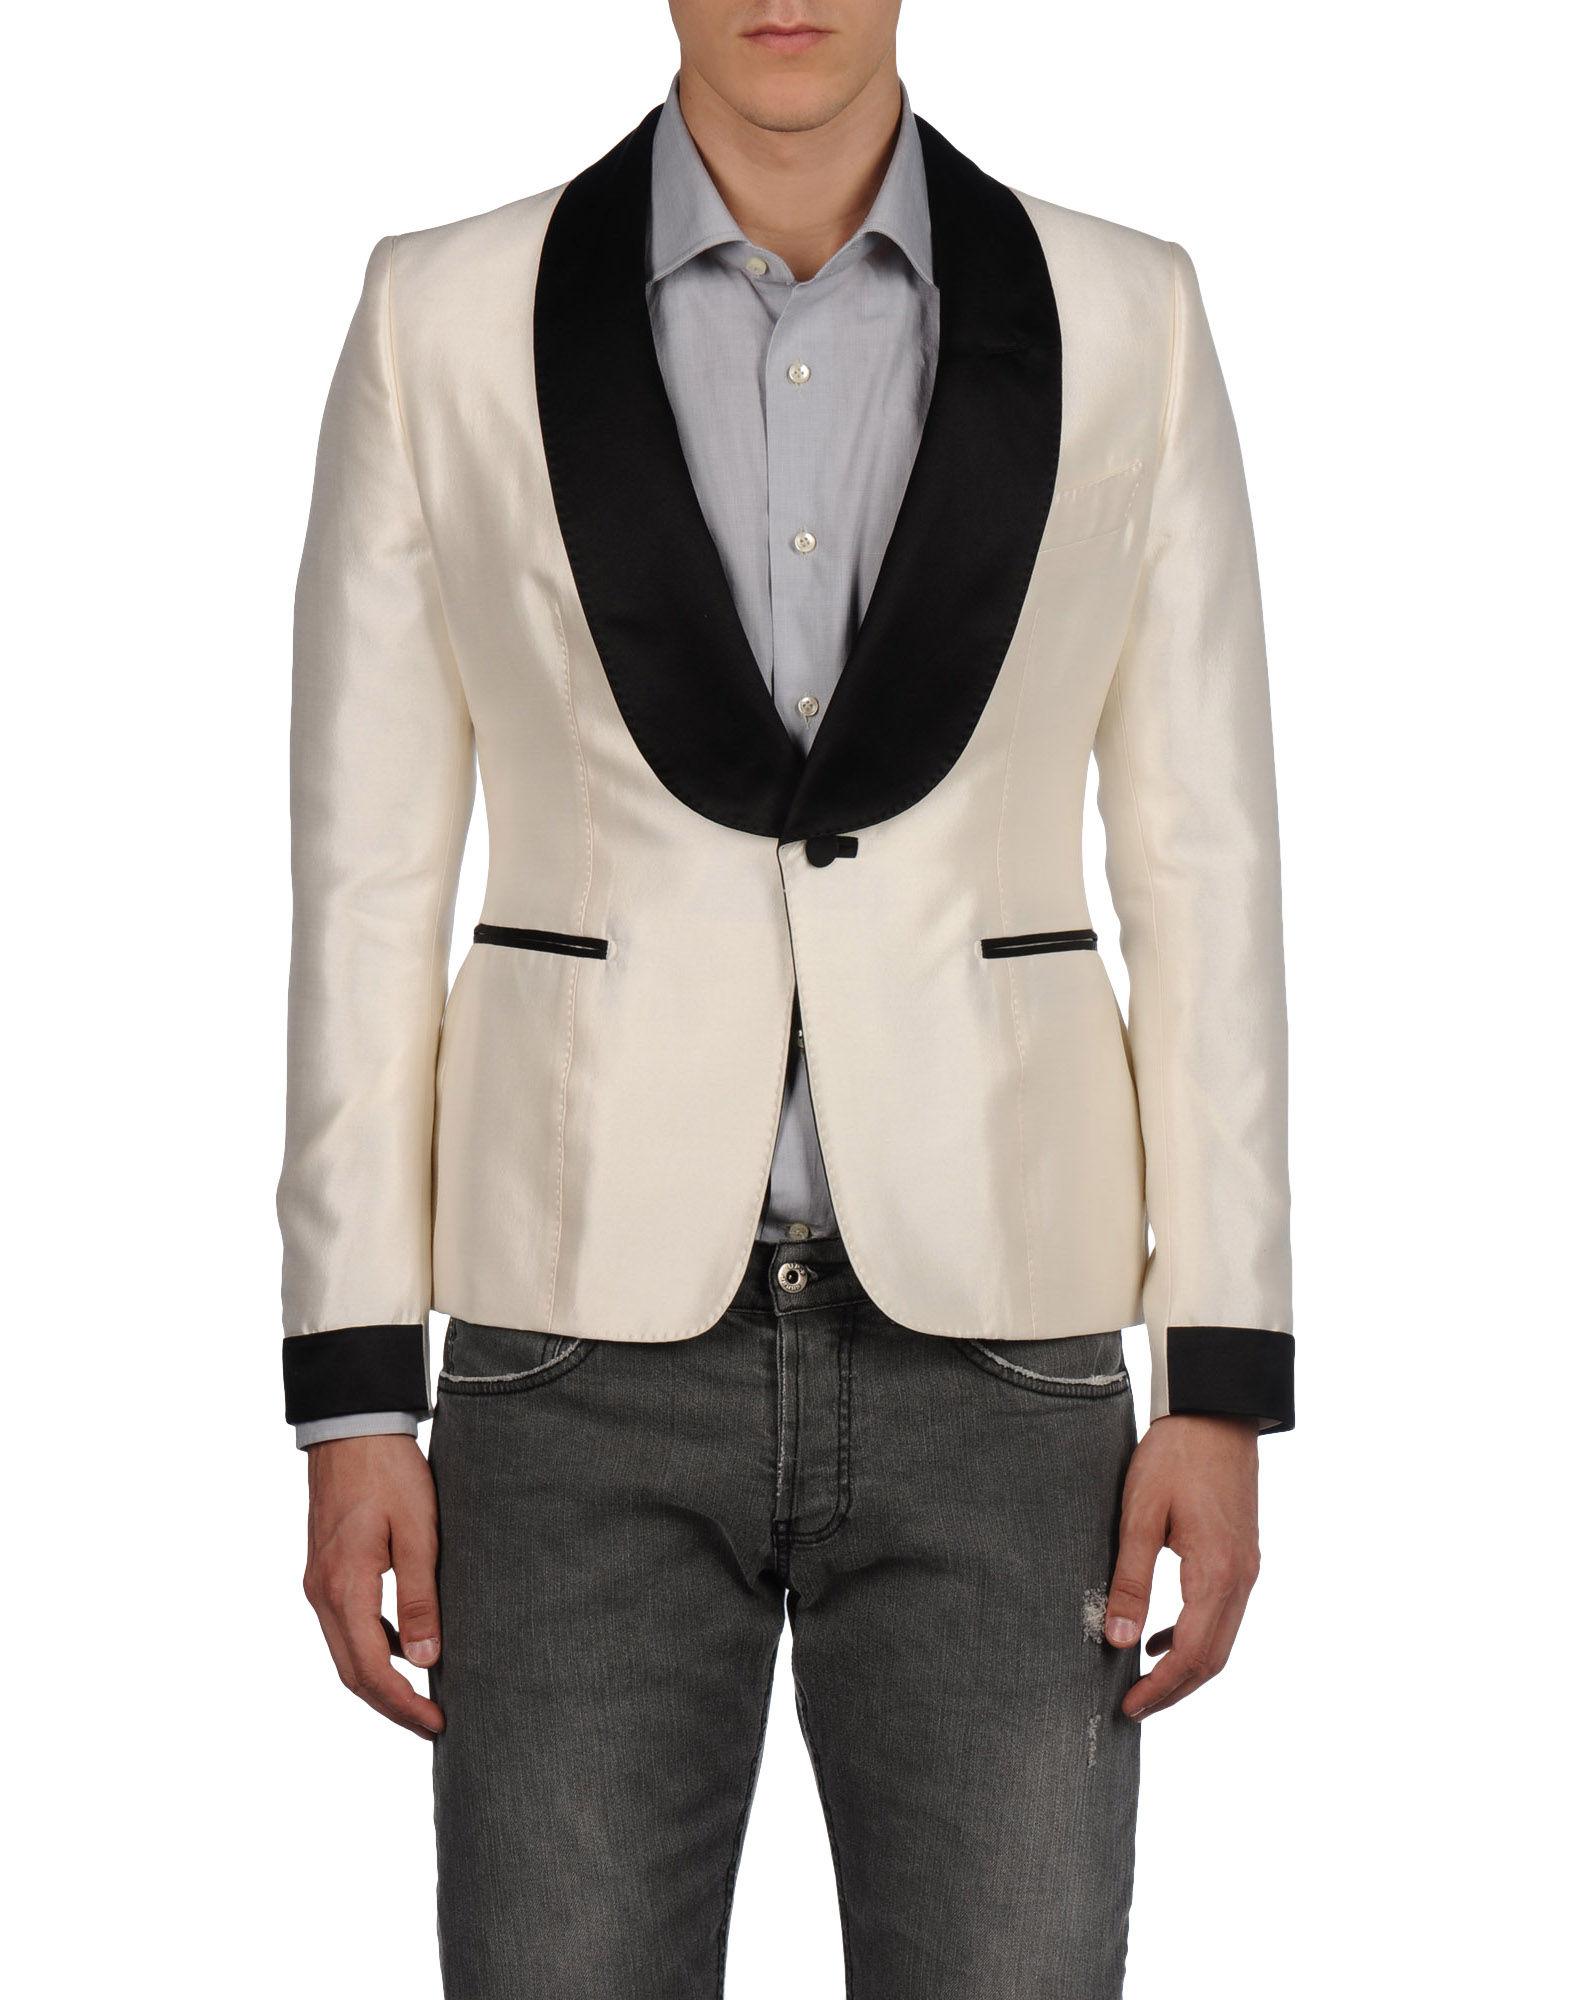 tom ford blazers in white for men ivory lyst. Black Bedroom Furniture Sets. Home Design Ideas